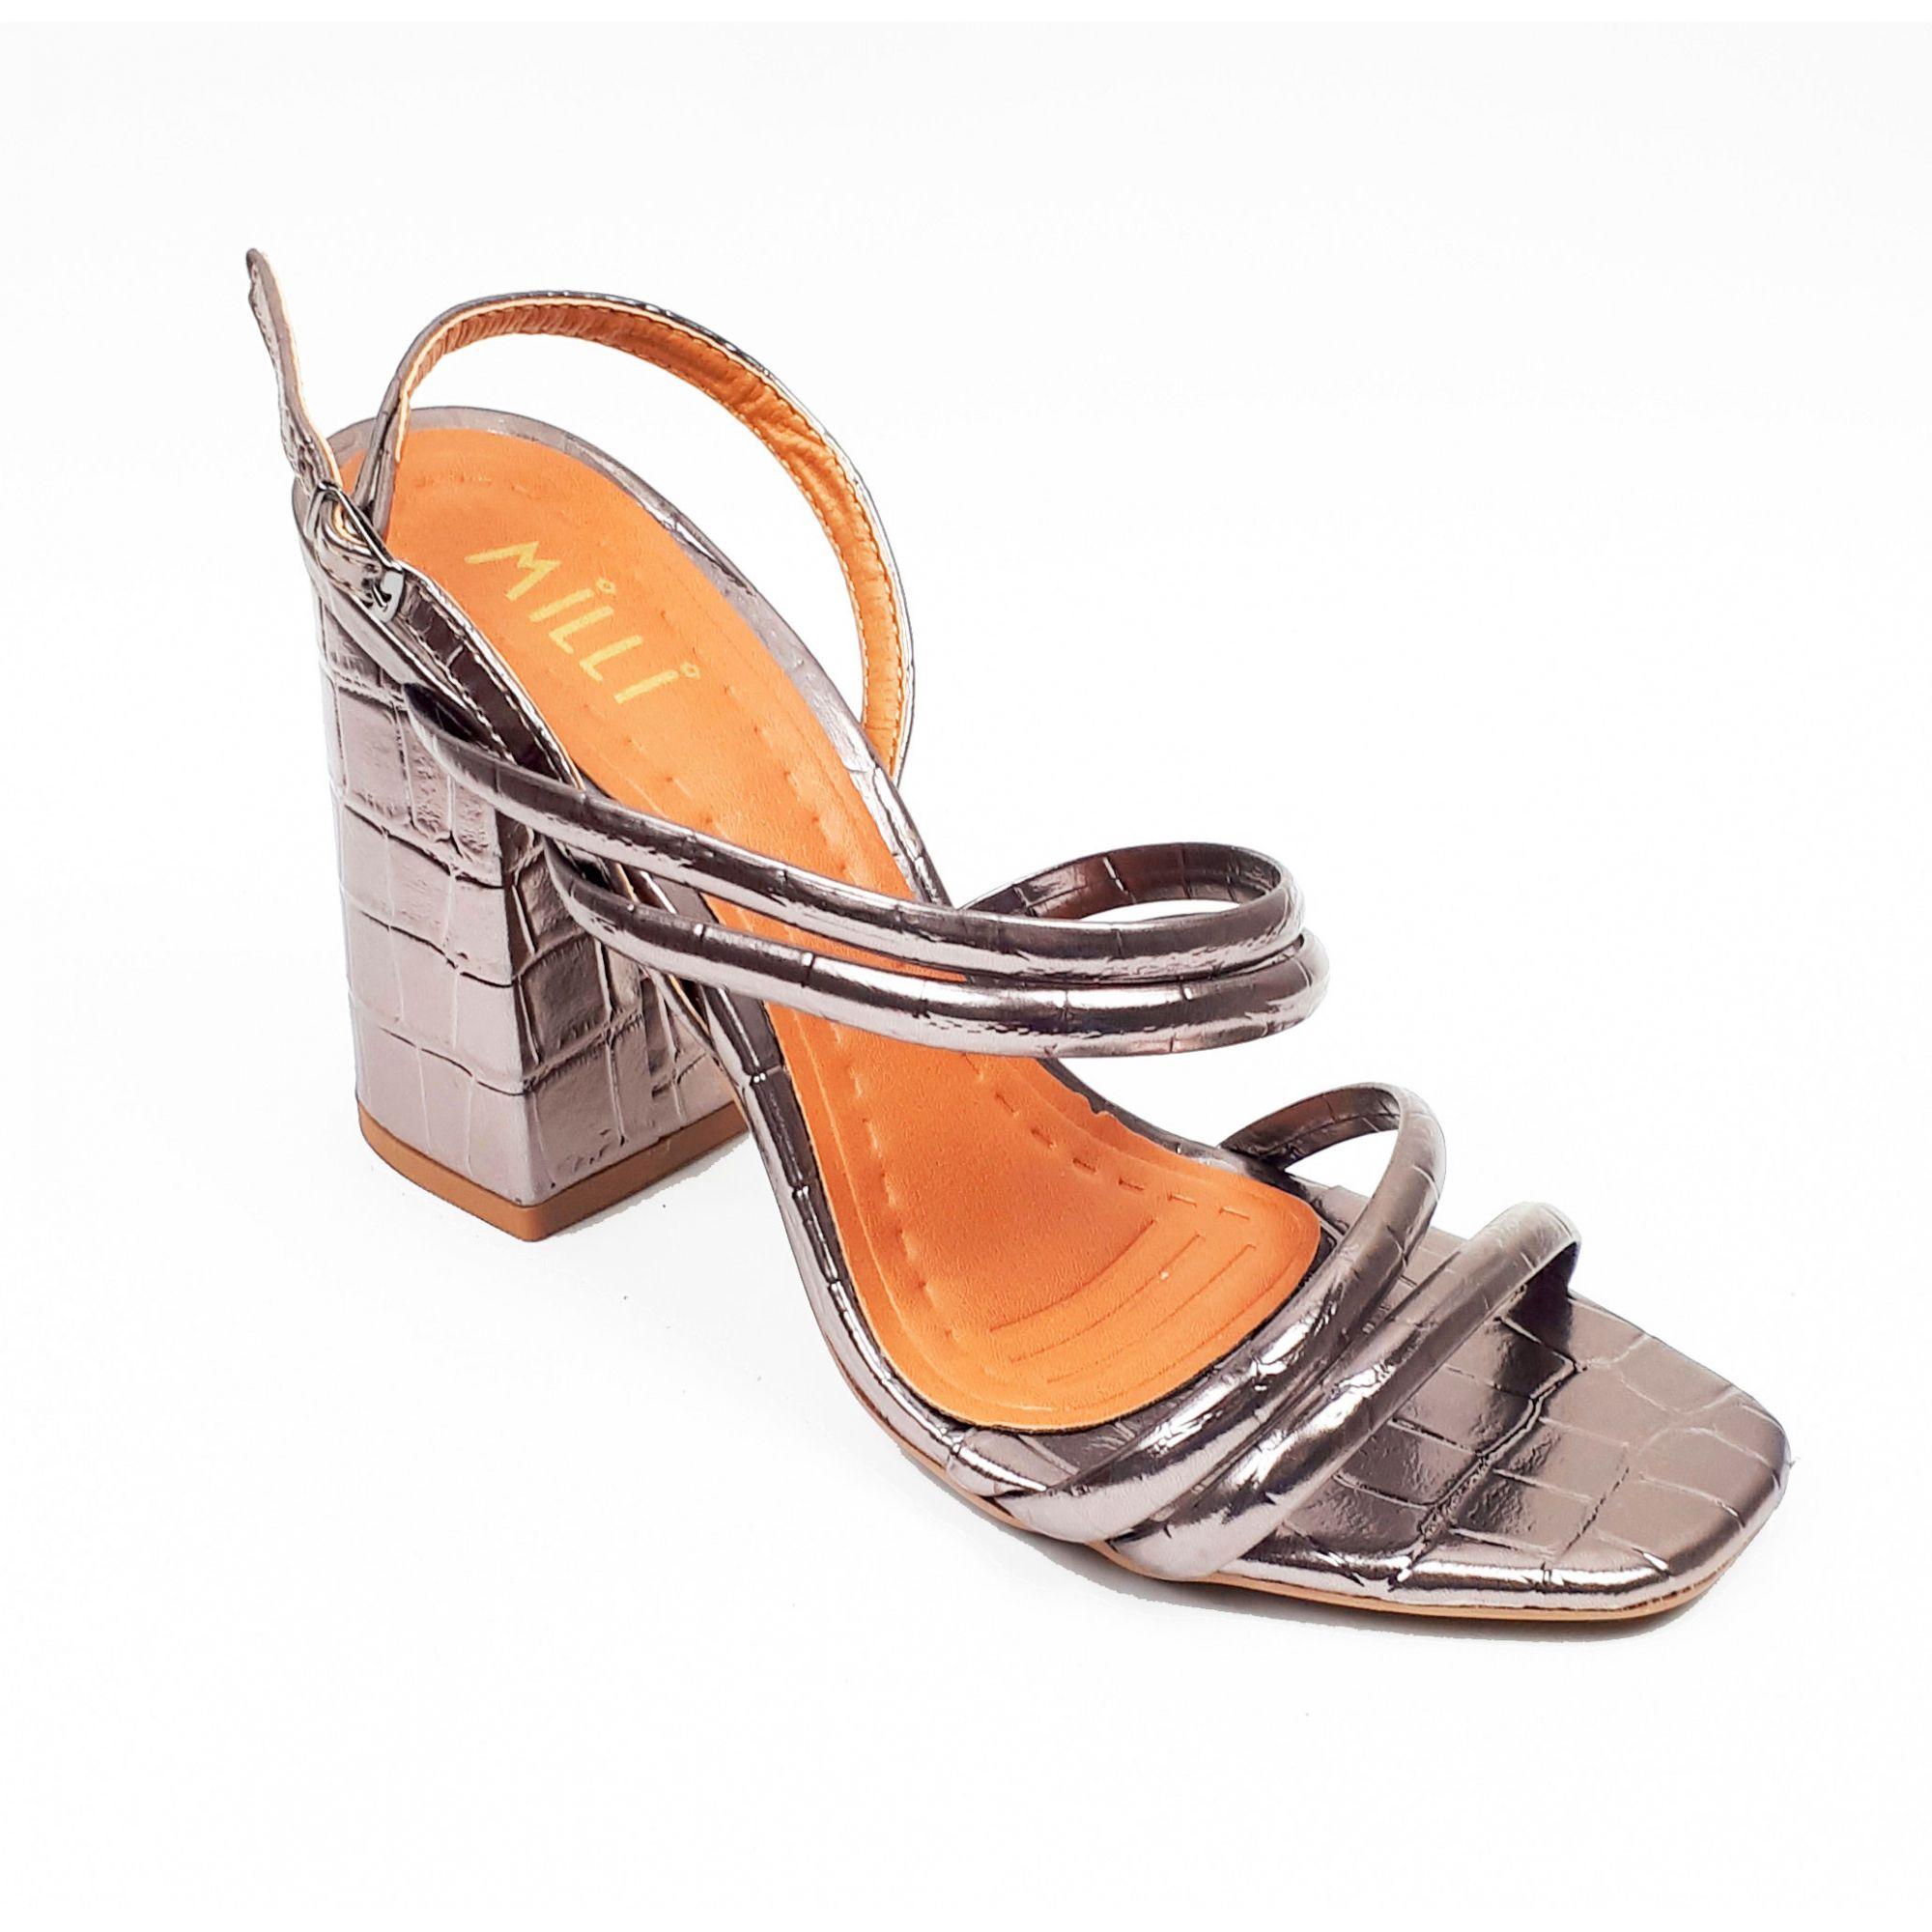 Sandália metalizada croco ônix